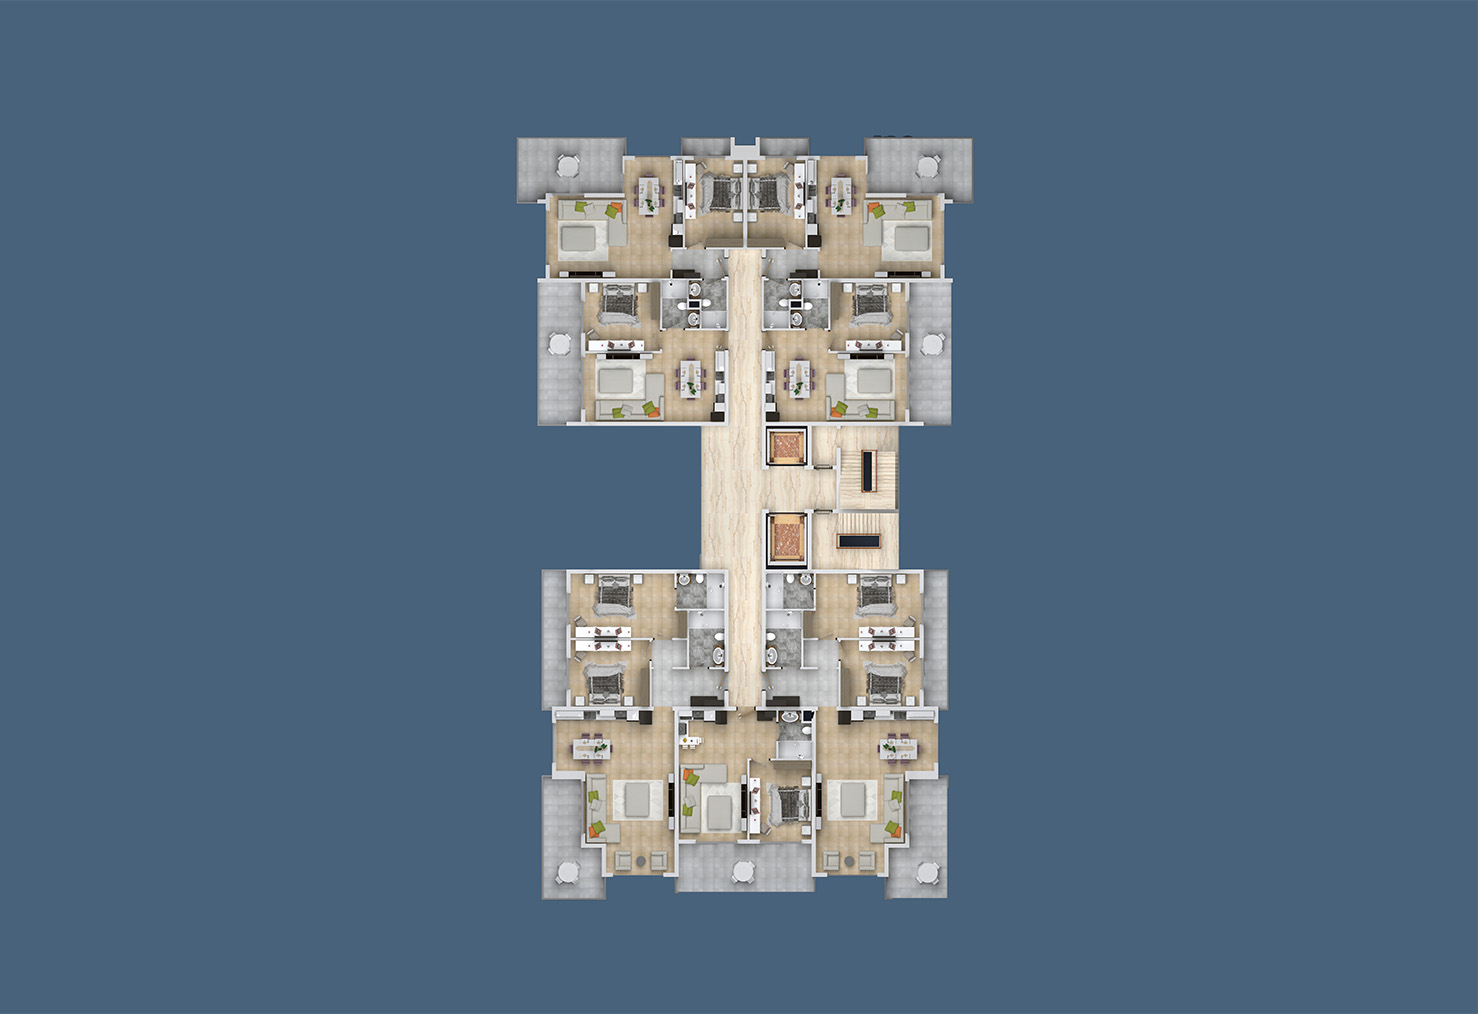 План расположения квартир 5 этаж A Yekta Kingdom Trade Center